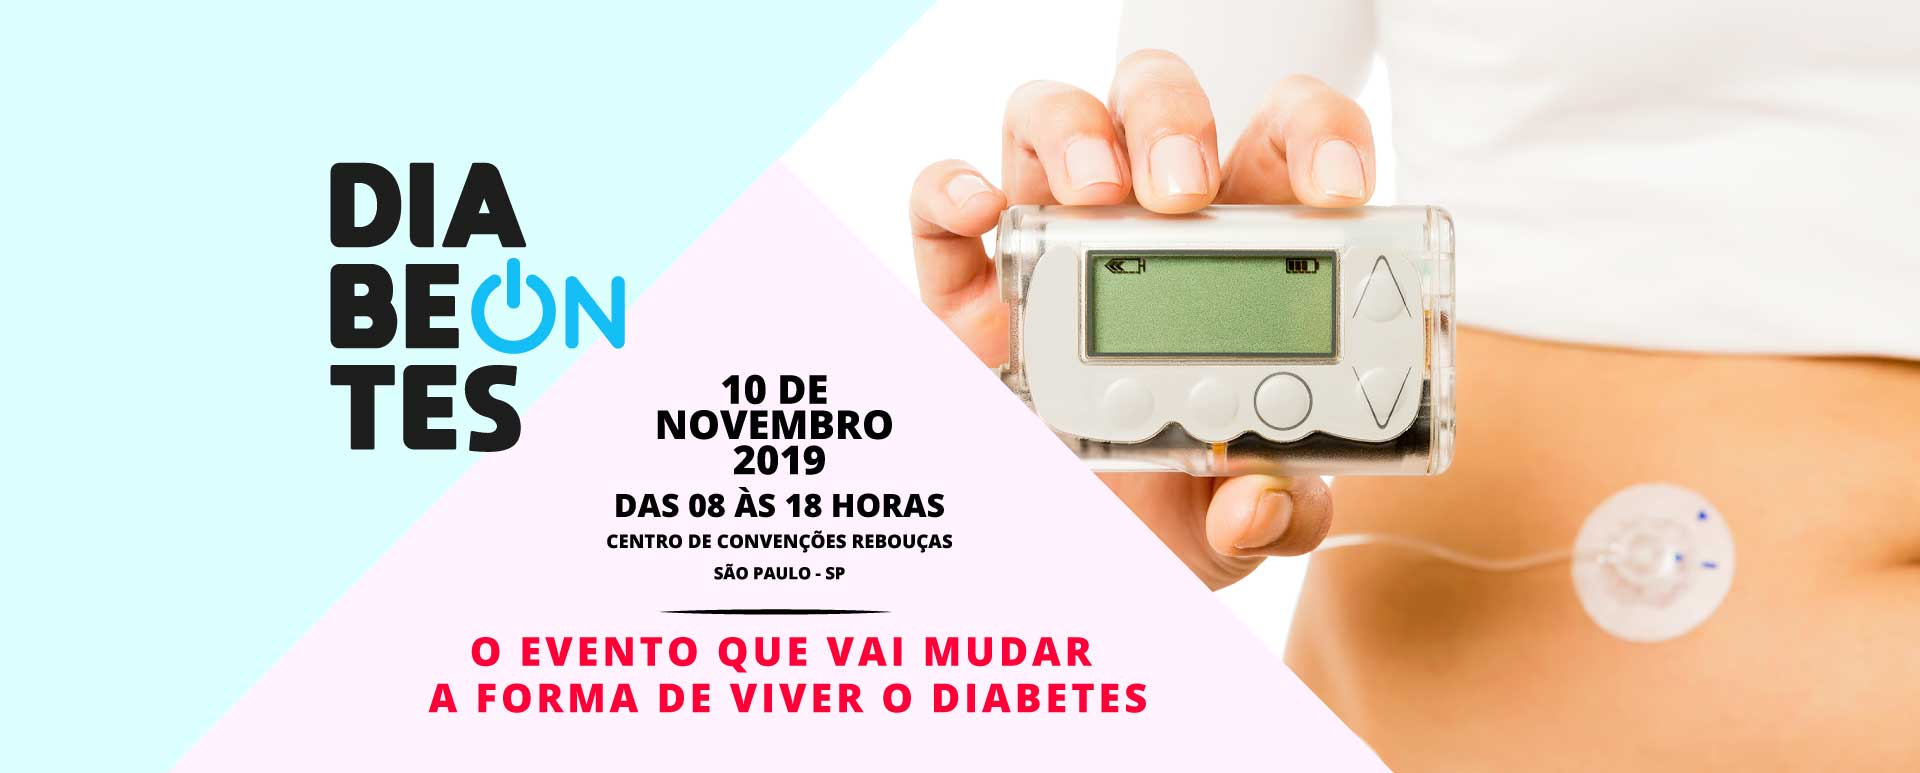 Diabetes On - O Evento